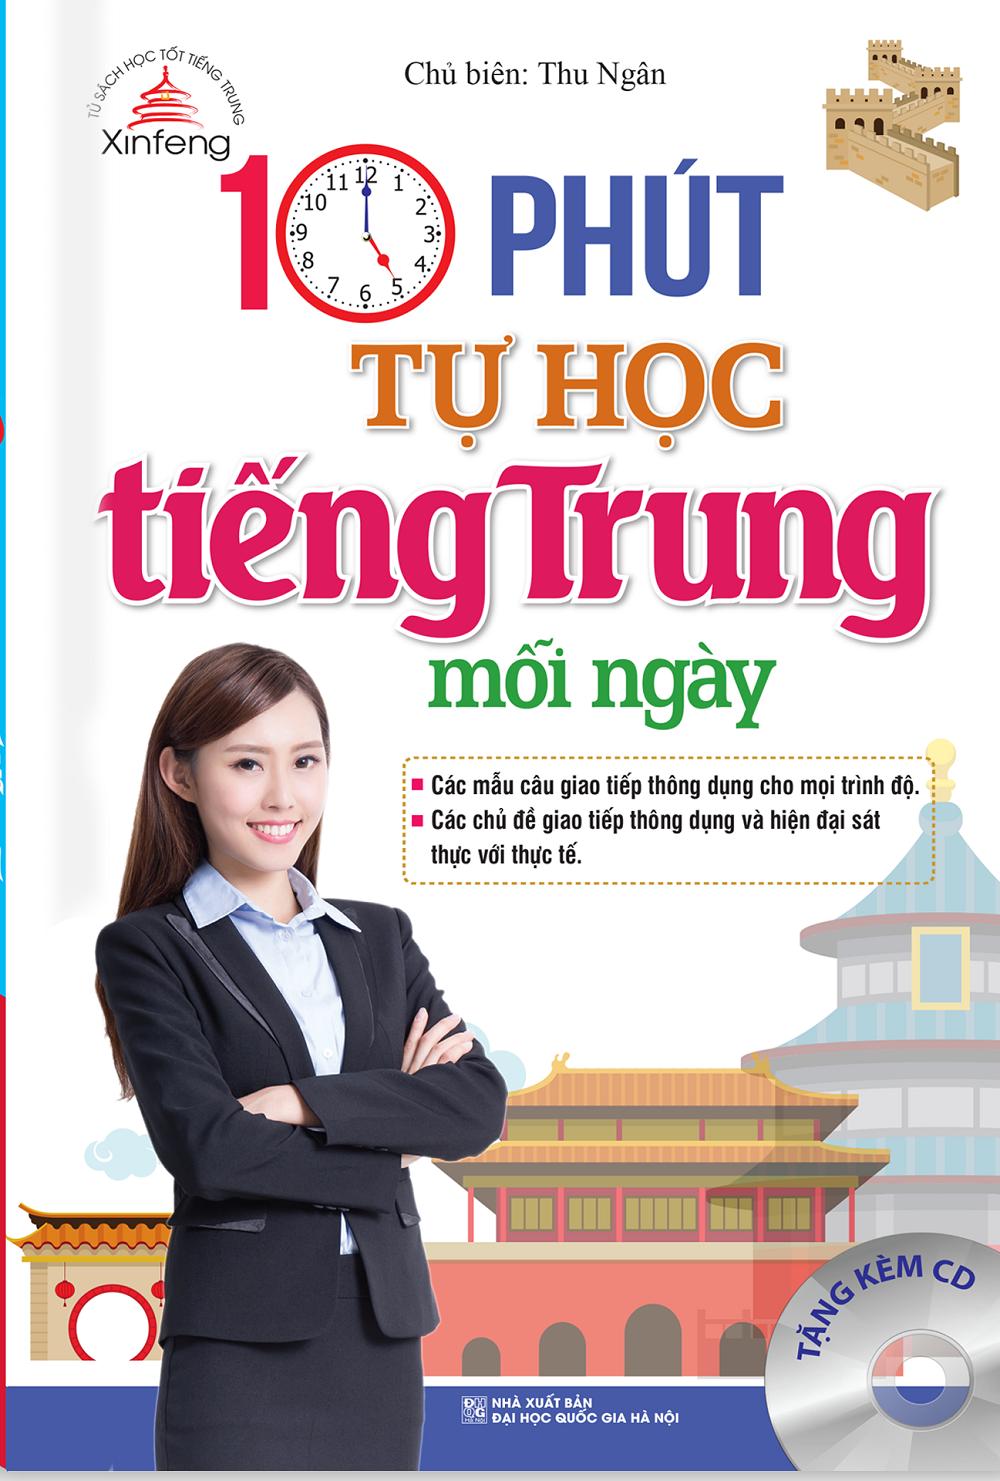 10-phut-tu-hoc-tieng-trung-moi-ngay-65k.u547.d20161221.t114146.811272.png